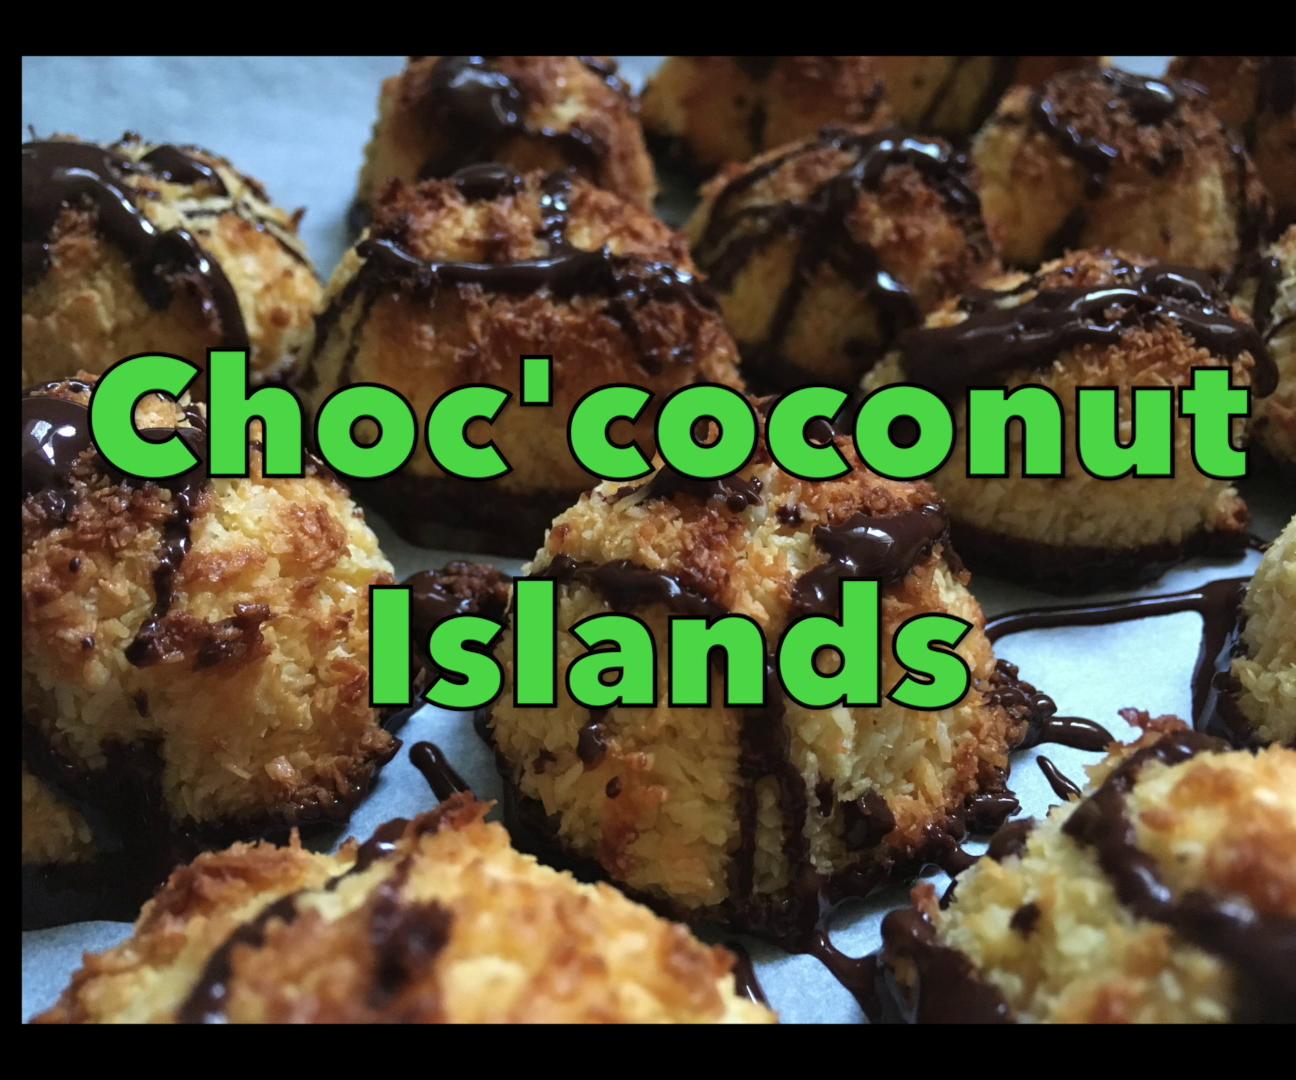 Choc'coconut Islands